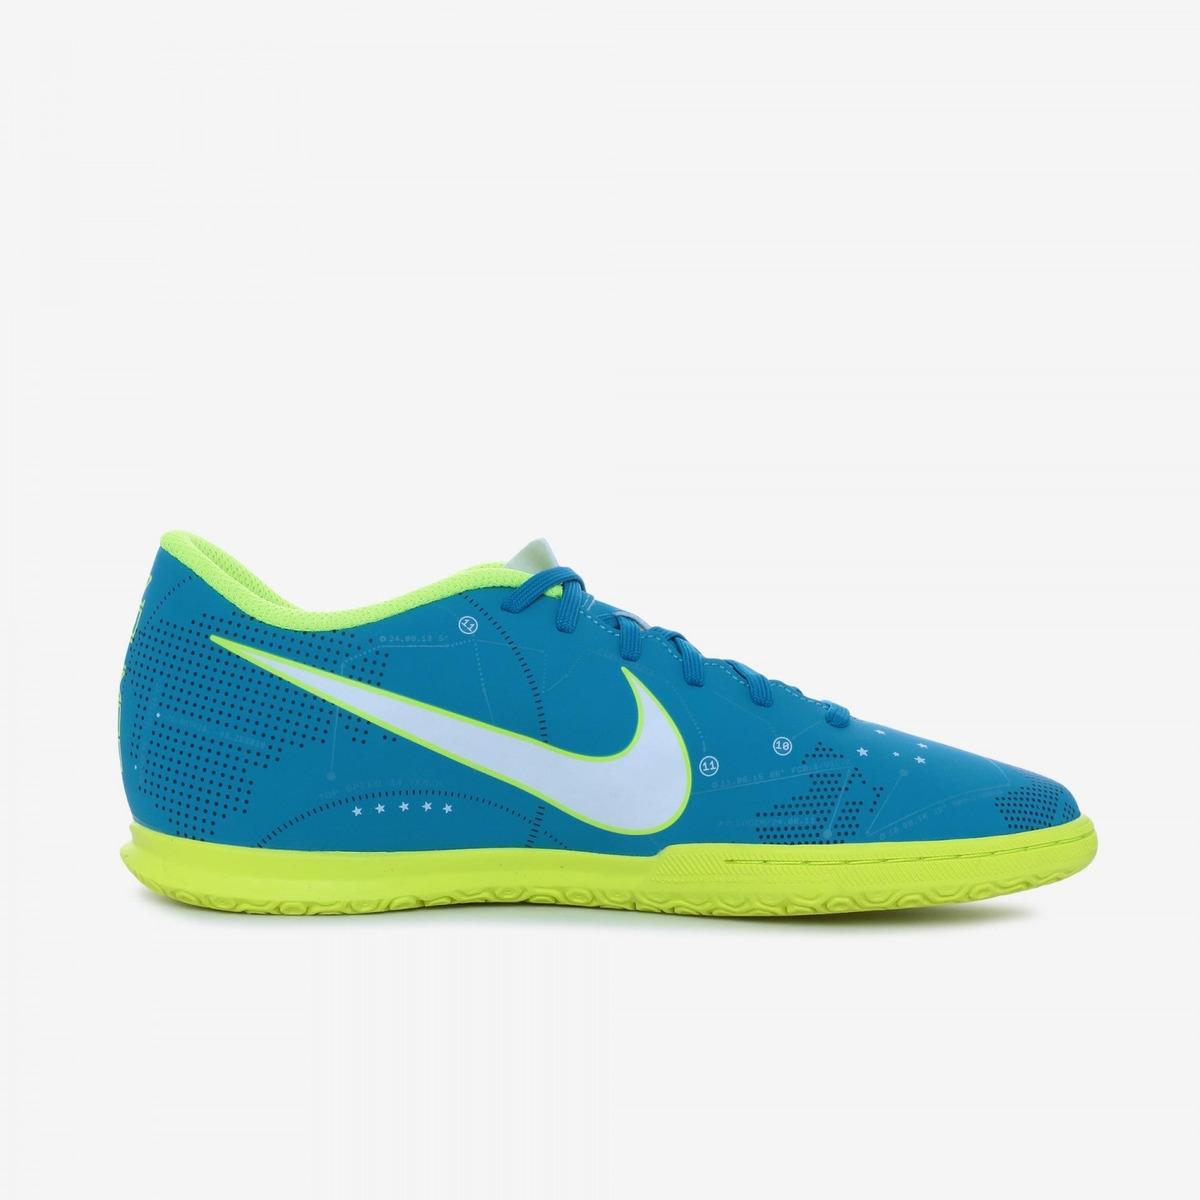 d405b44fc8806 Chuteira Nike Mercurial X Vortex Iii Neymar Futsal - 39 - Az - R ...